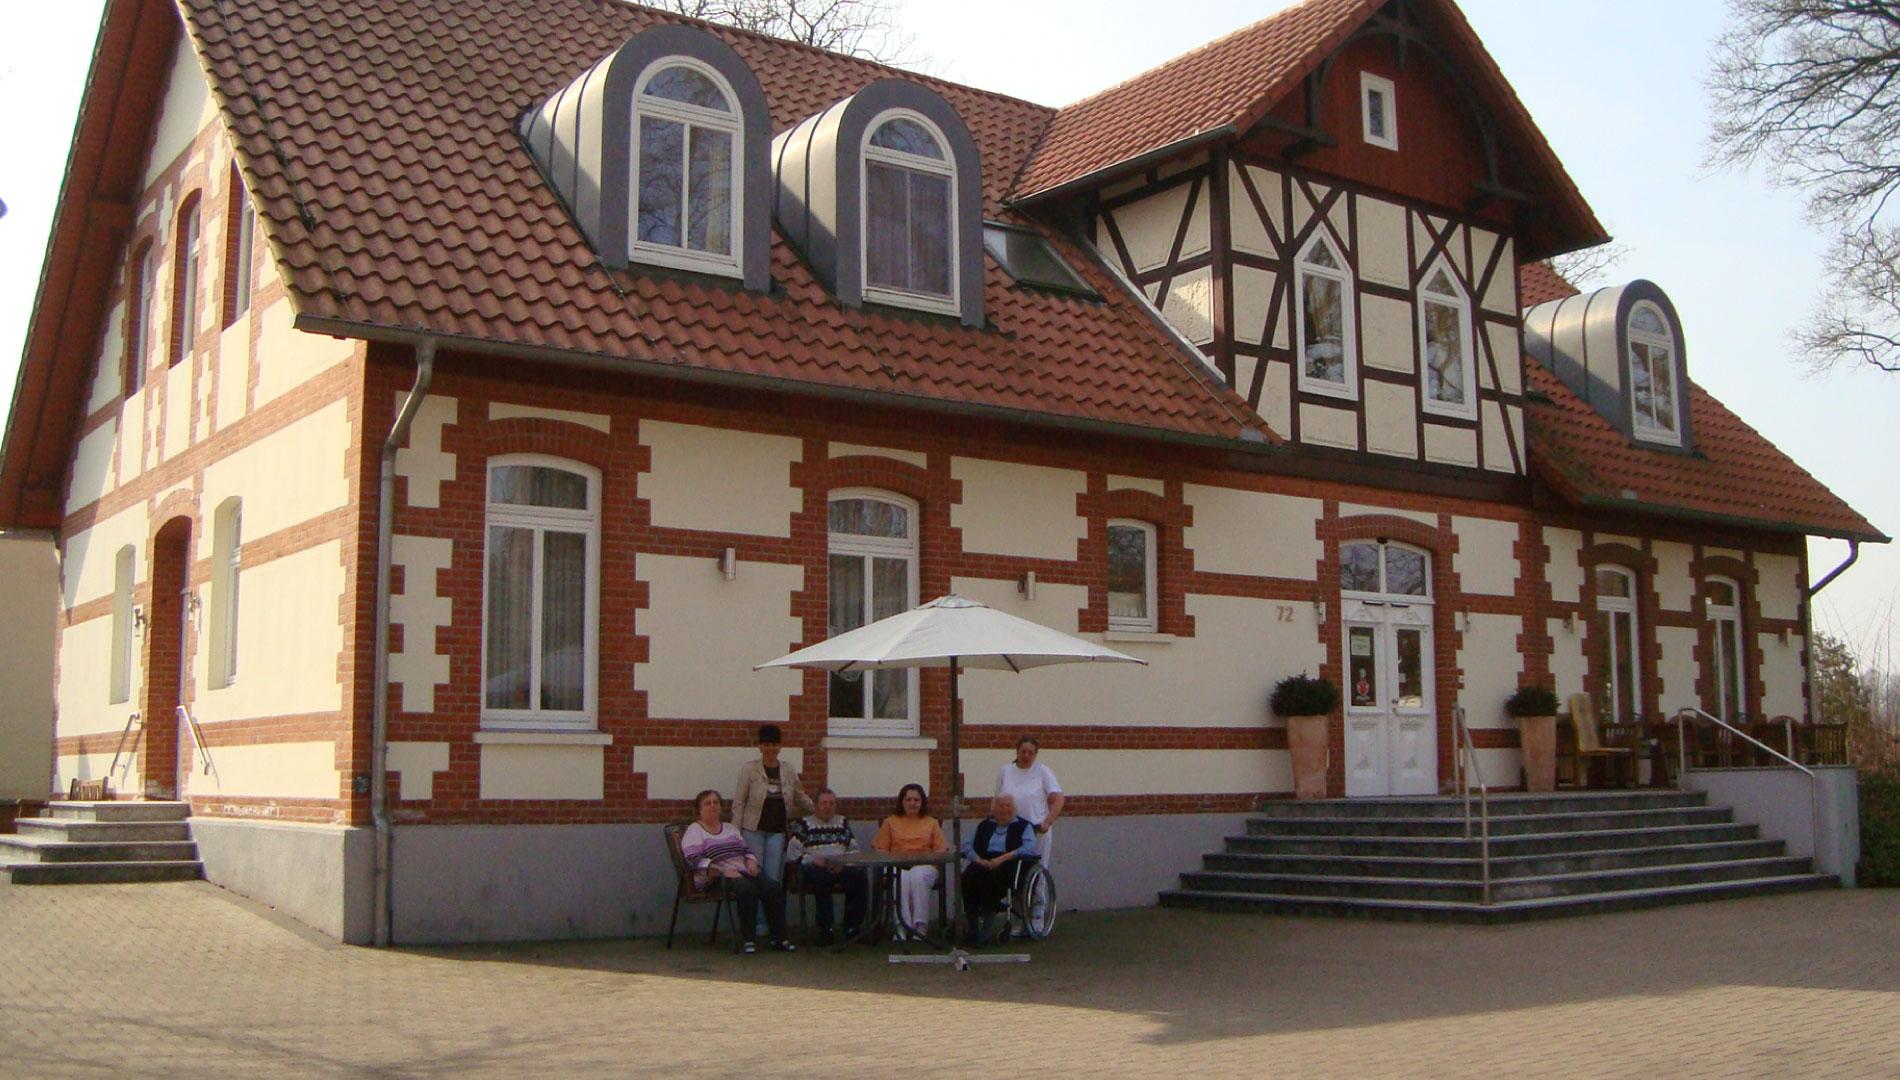 Stationäre Pflegeeinrichtung Pflege- & Betreuungszentrum Landsitz Hohenholz